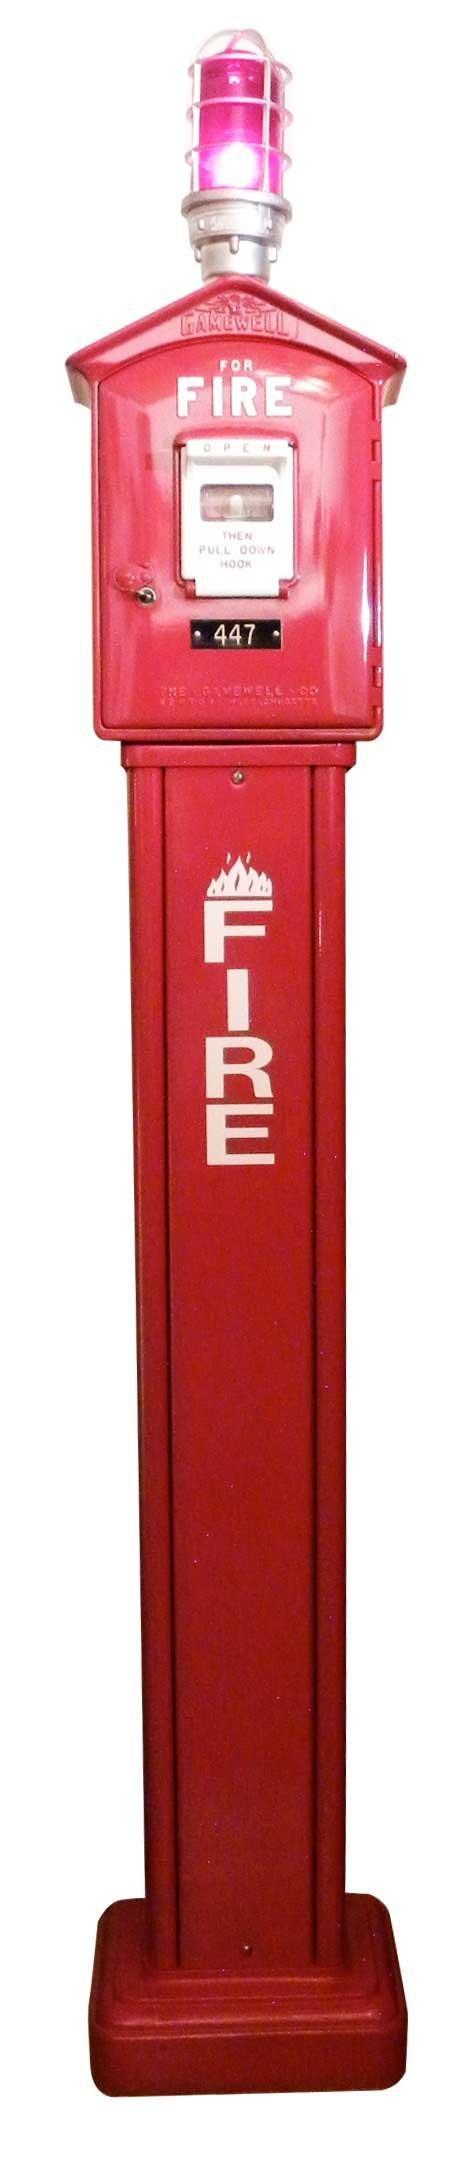 1249A: Gamewell Fire Call Box